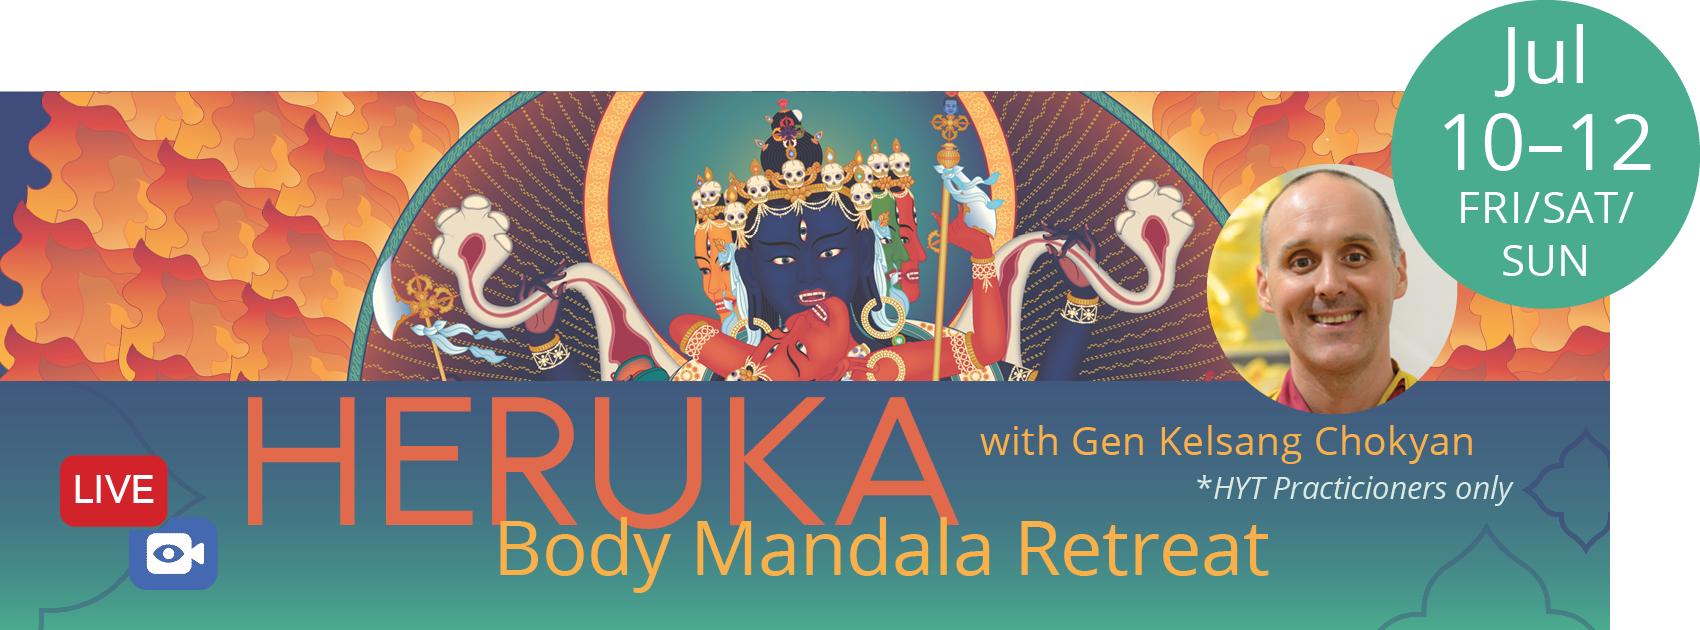 Heruka Body Mandala Retreat